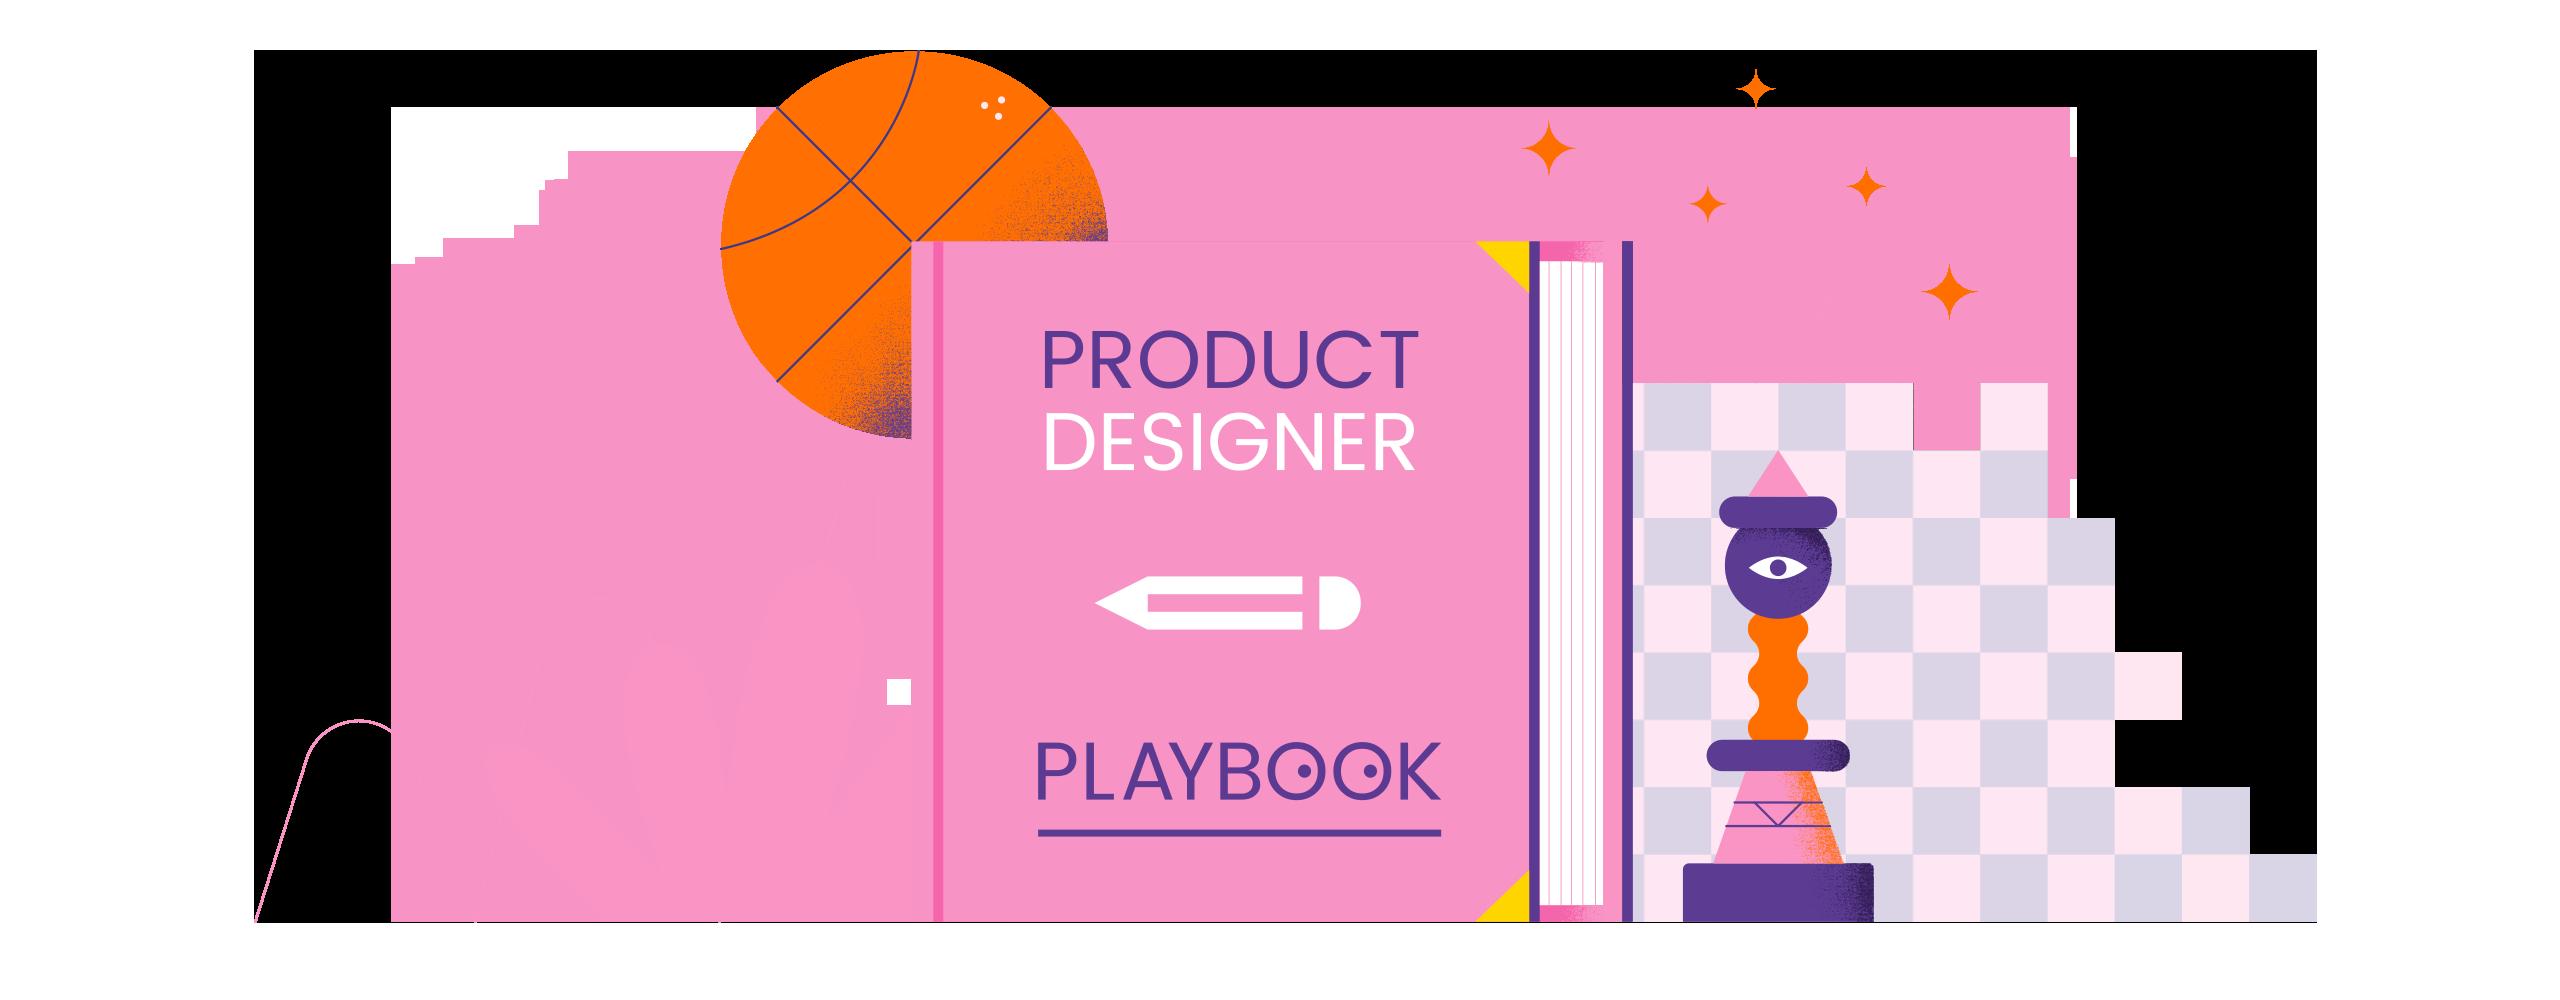 ProductDesigner.png